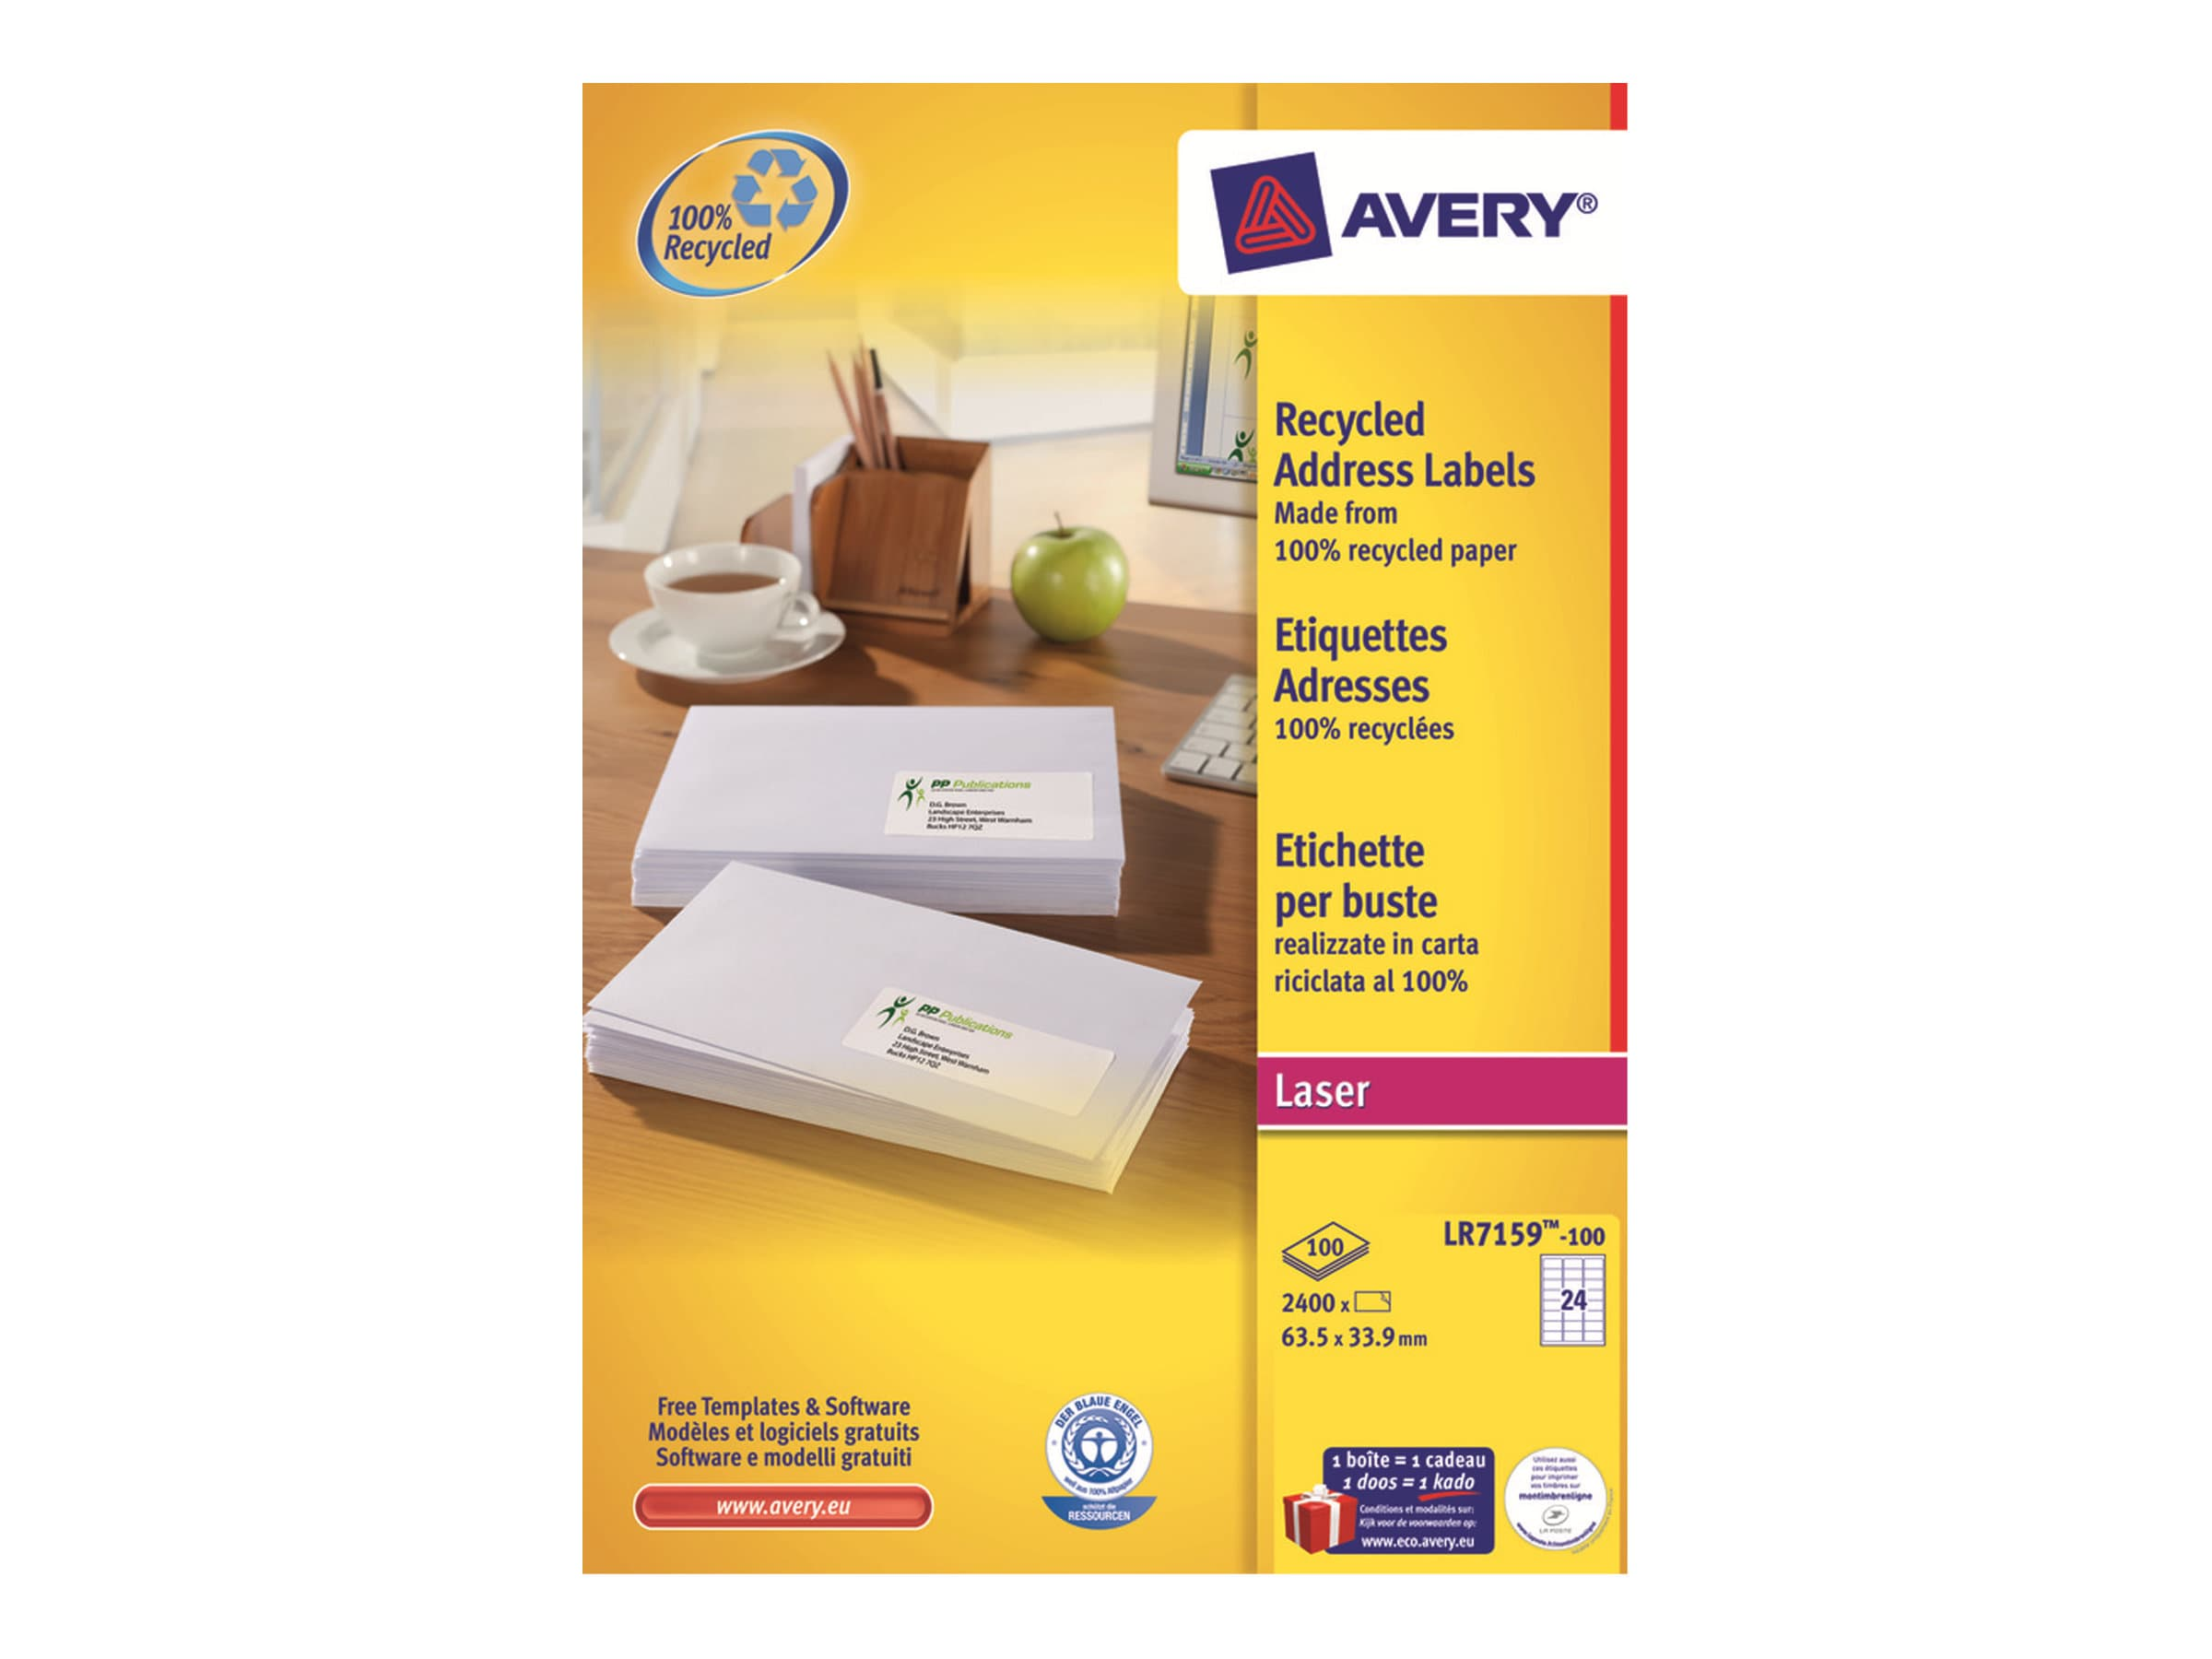 Avery - 2400 Étiquettes adresse recyclées blanches - 63,5 x 33,9 mm - Impression laser - réf LR7159-100